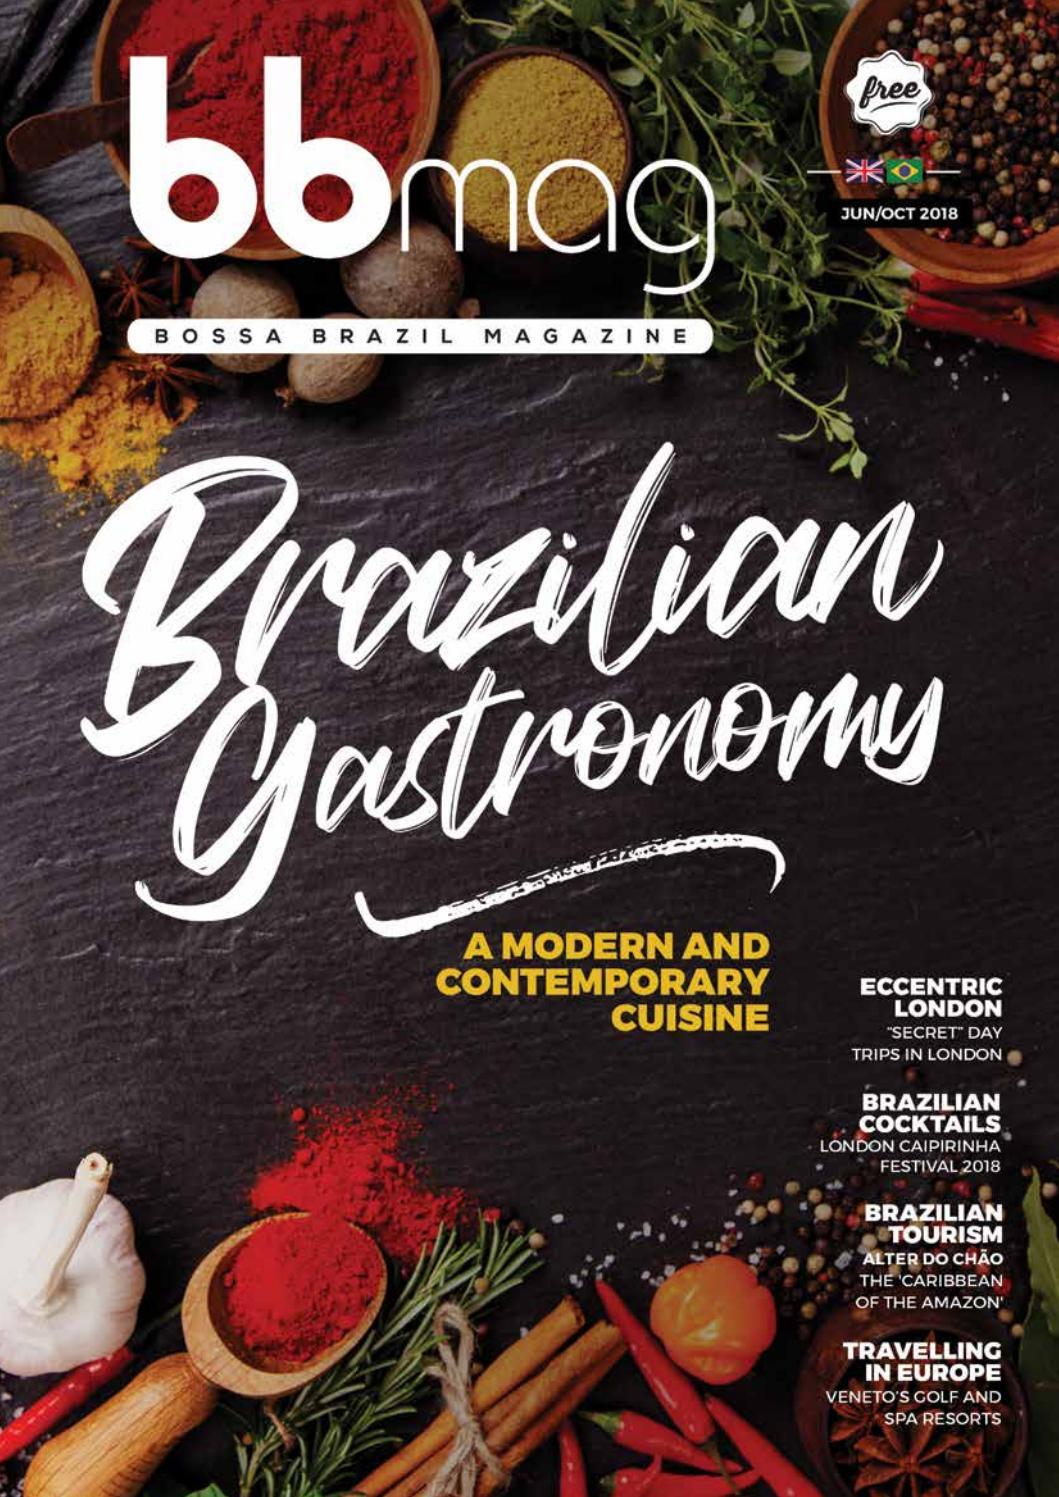 Bossa Brazil Magazine (BBMAG) issue 7 June to October 2018